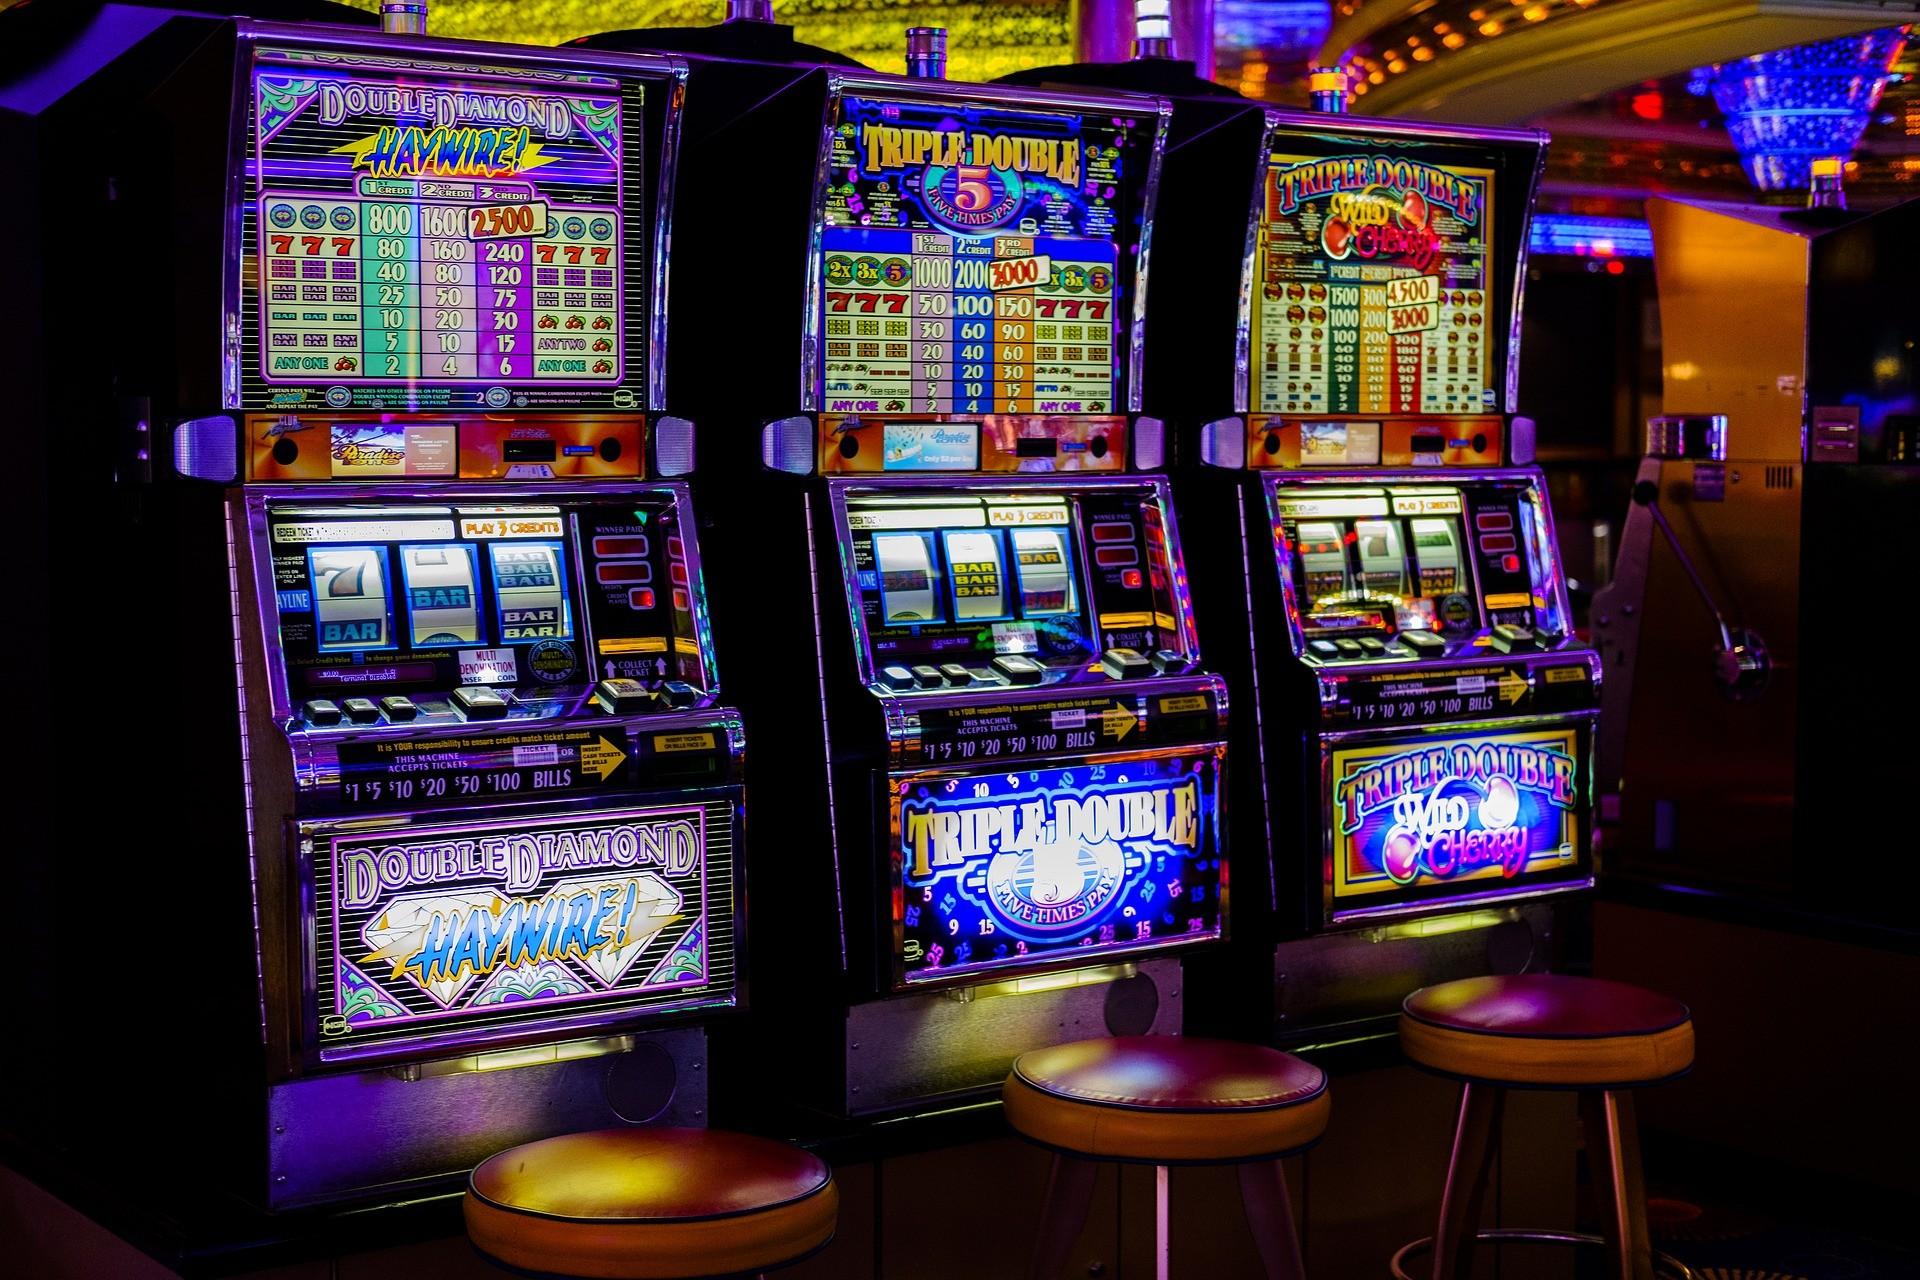 Gagner au Casino avec marabout JINLE AYO Appel/Whatsapp: +22966869011